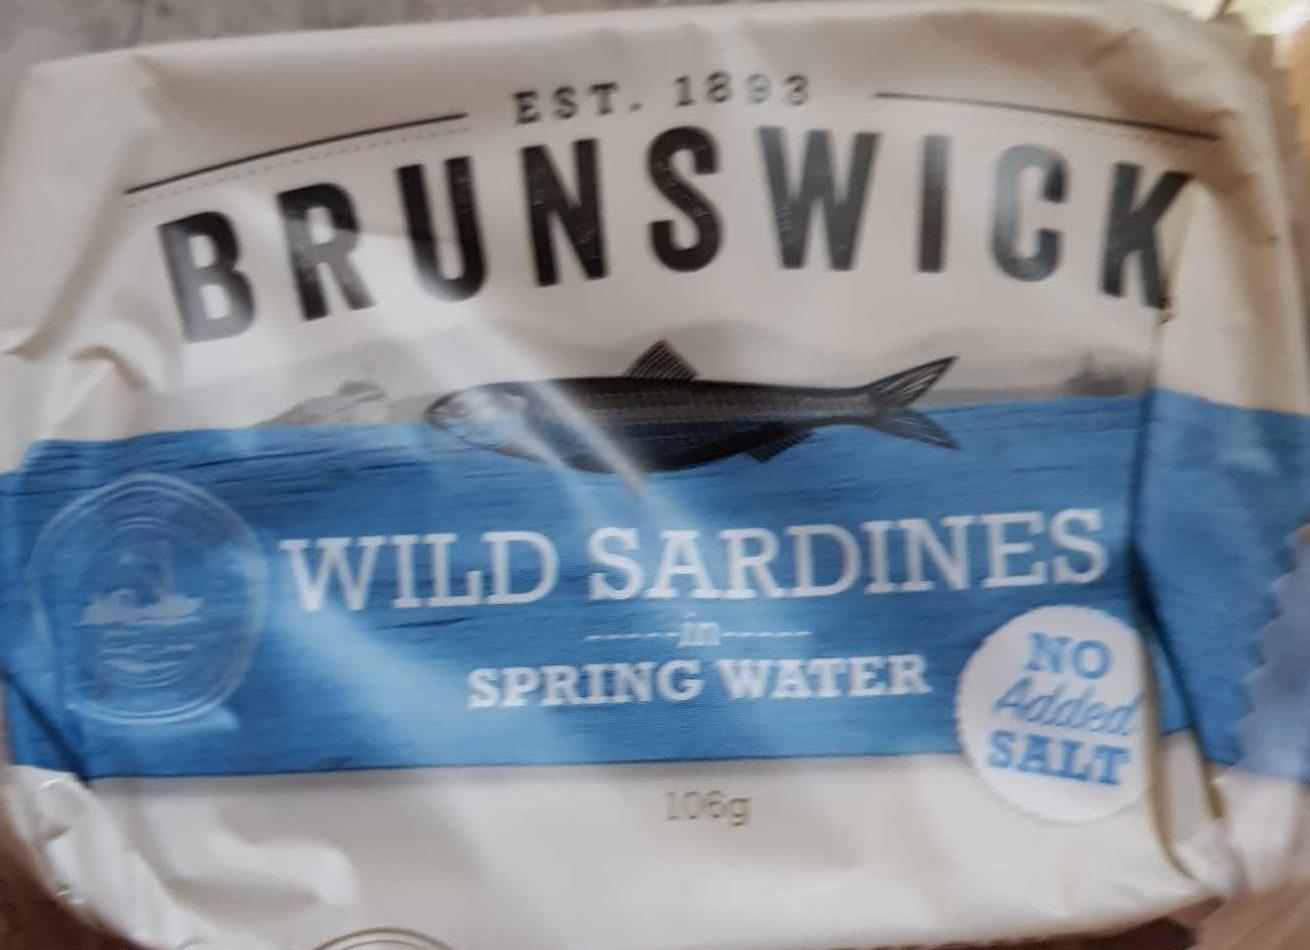 Brunswick Wild Sardines - Product